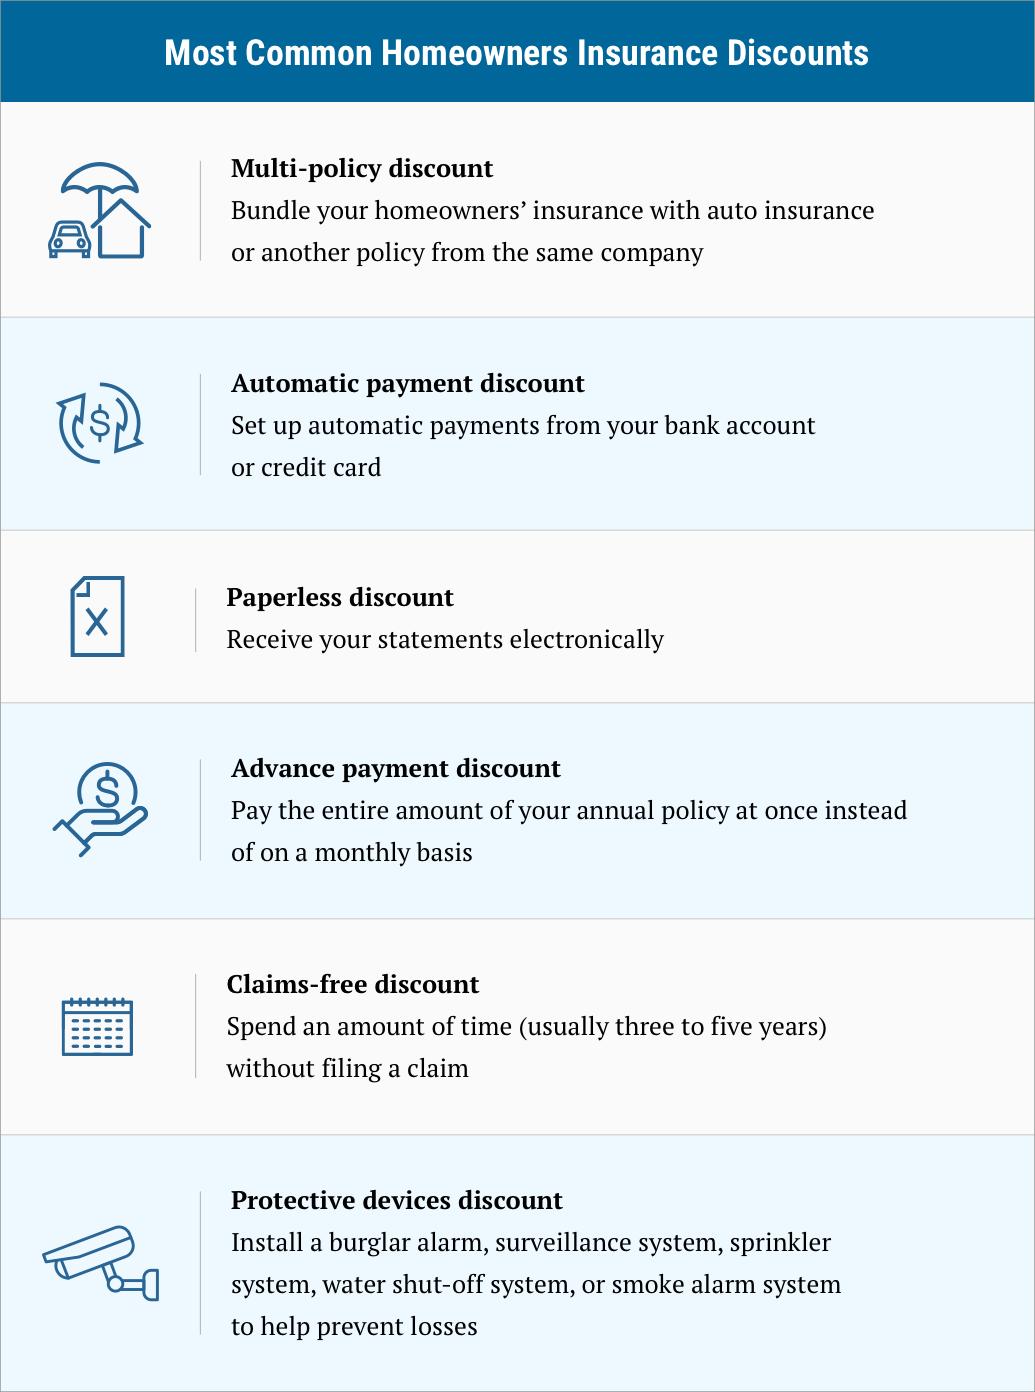 5 Best Homeowners Insurance Companies Of 2021 Money